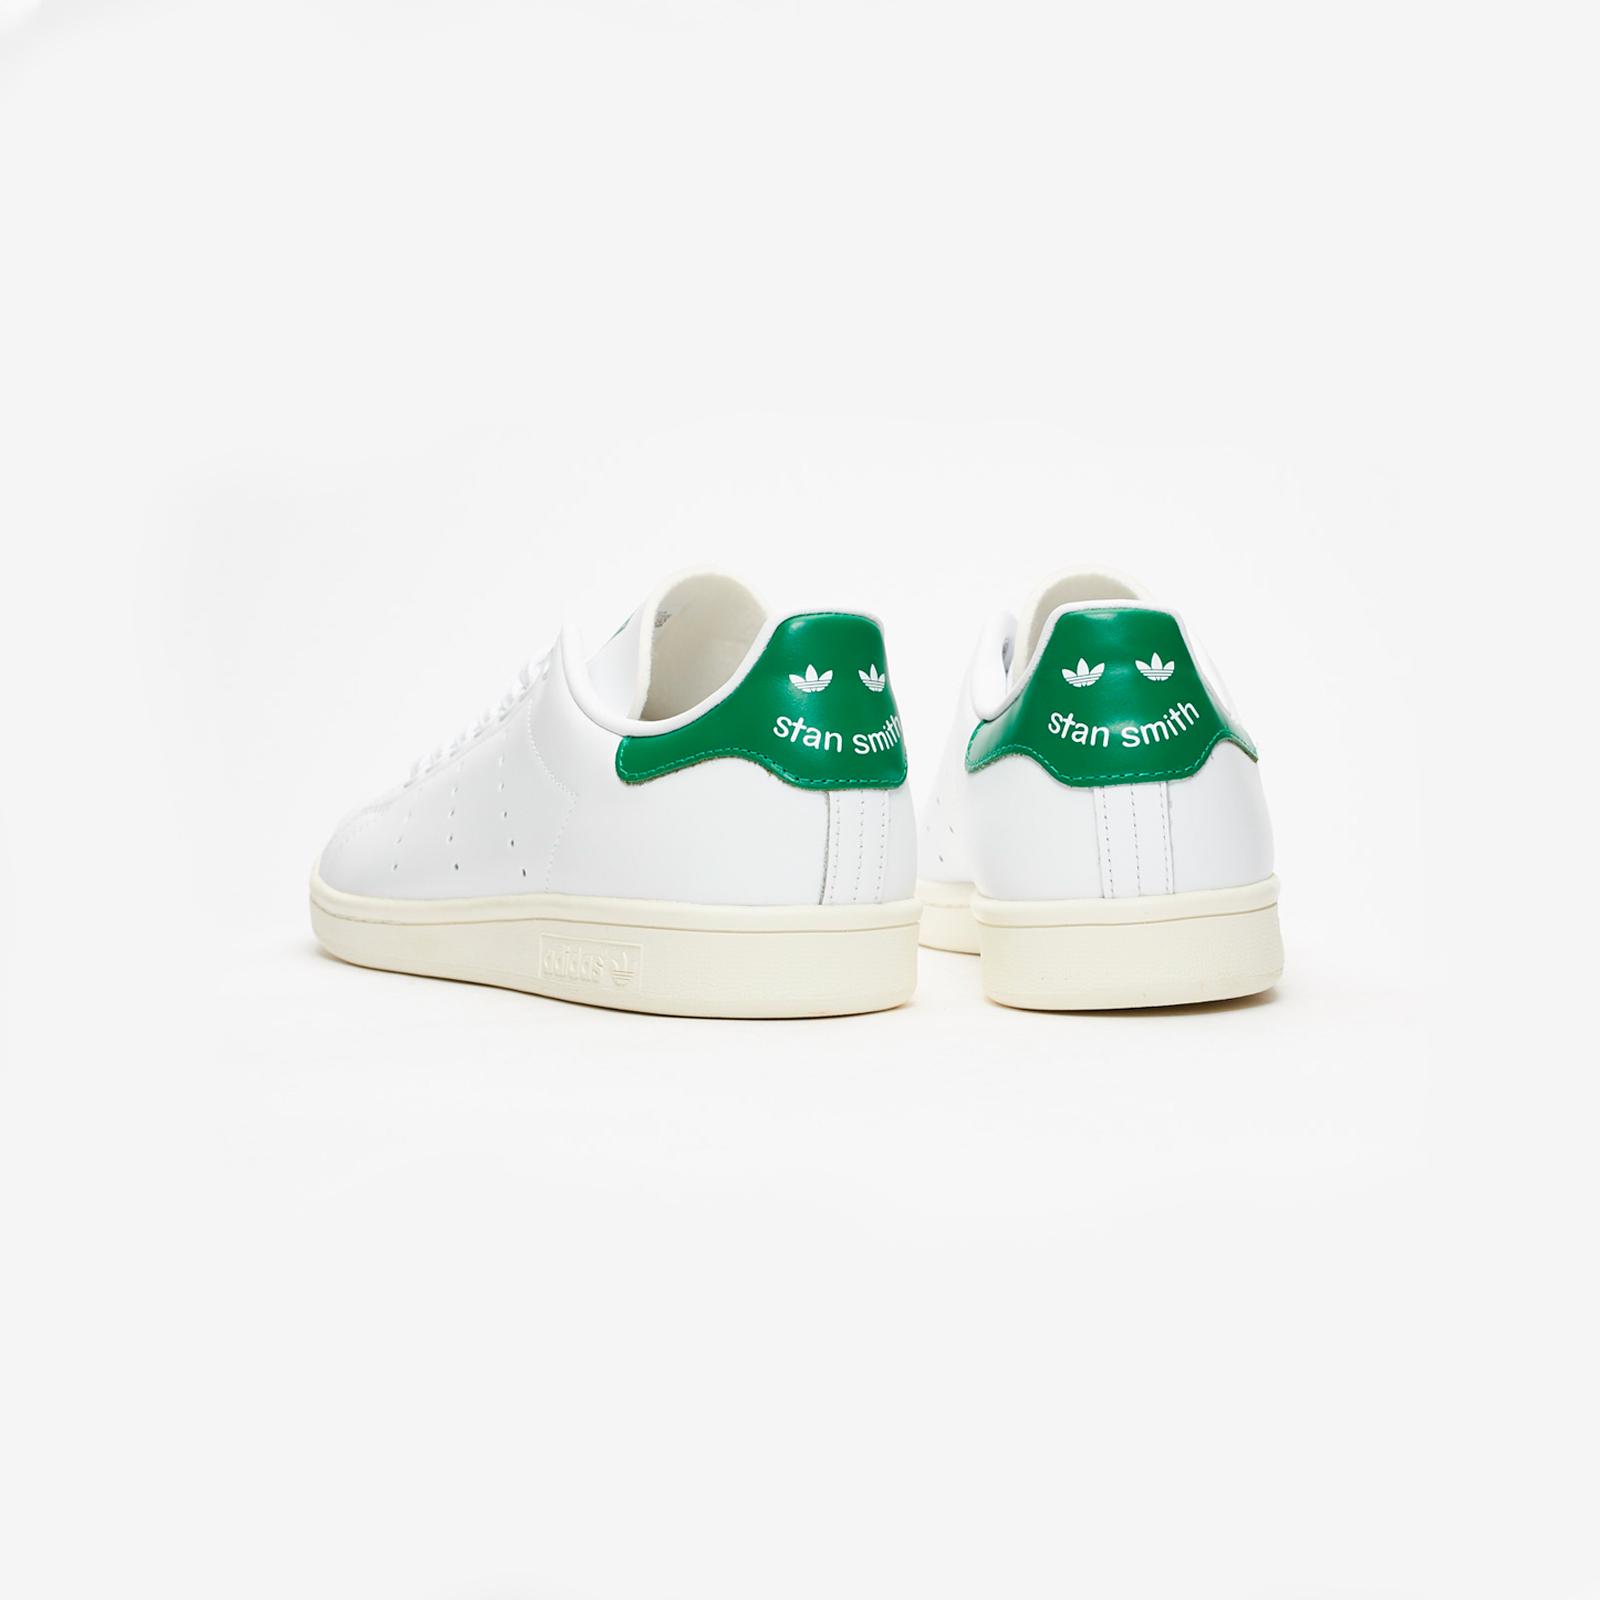 the best attitude 8d77c 70846 adidas Stan Smith - Bd7432 - Sneakersnstuff   sneakers   streetwear på  nätet sen 1999